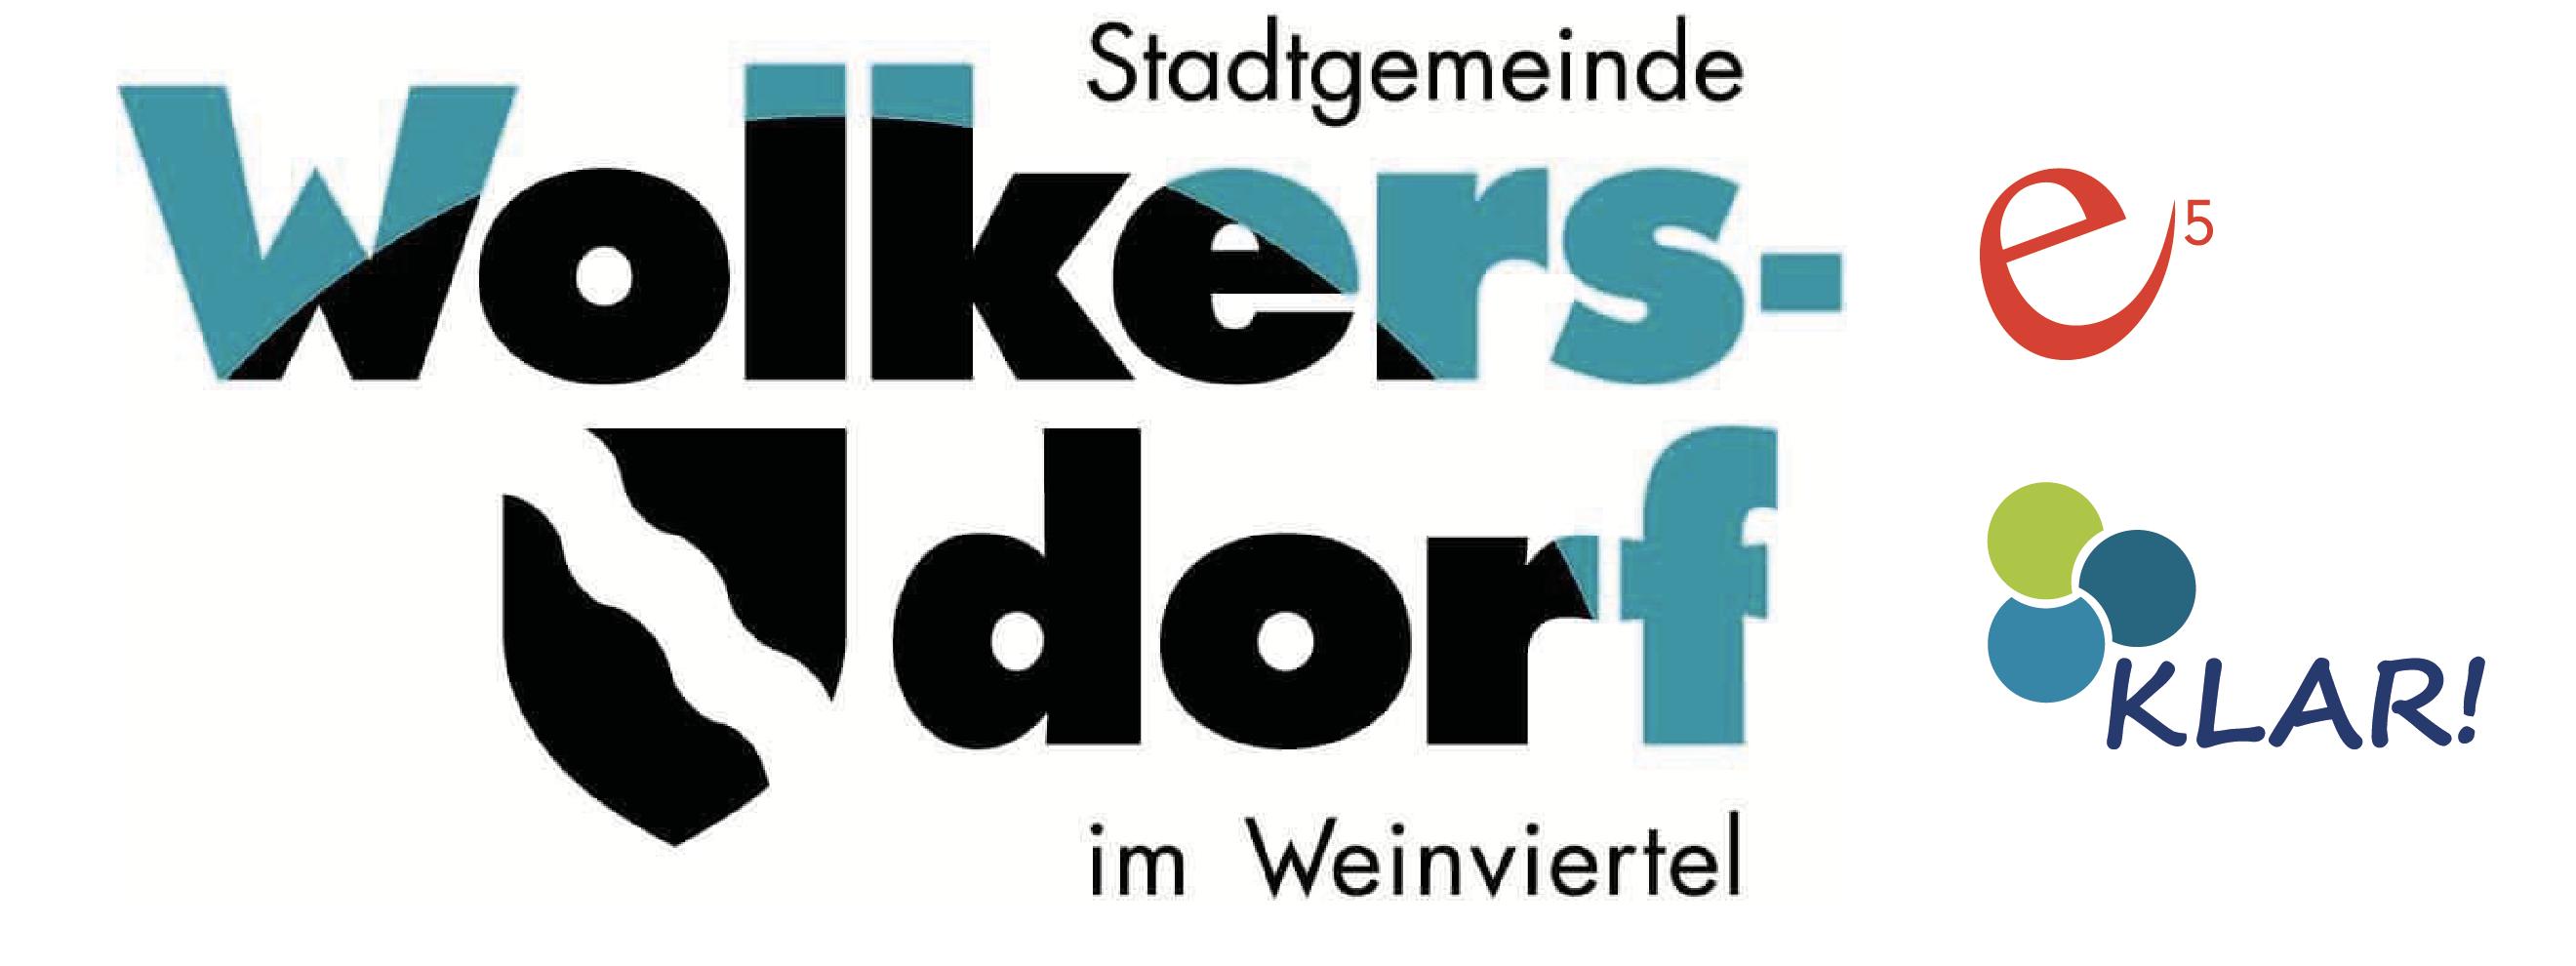 Stadtgemeinde Wolkersdorf